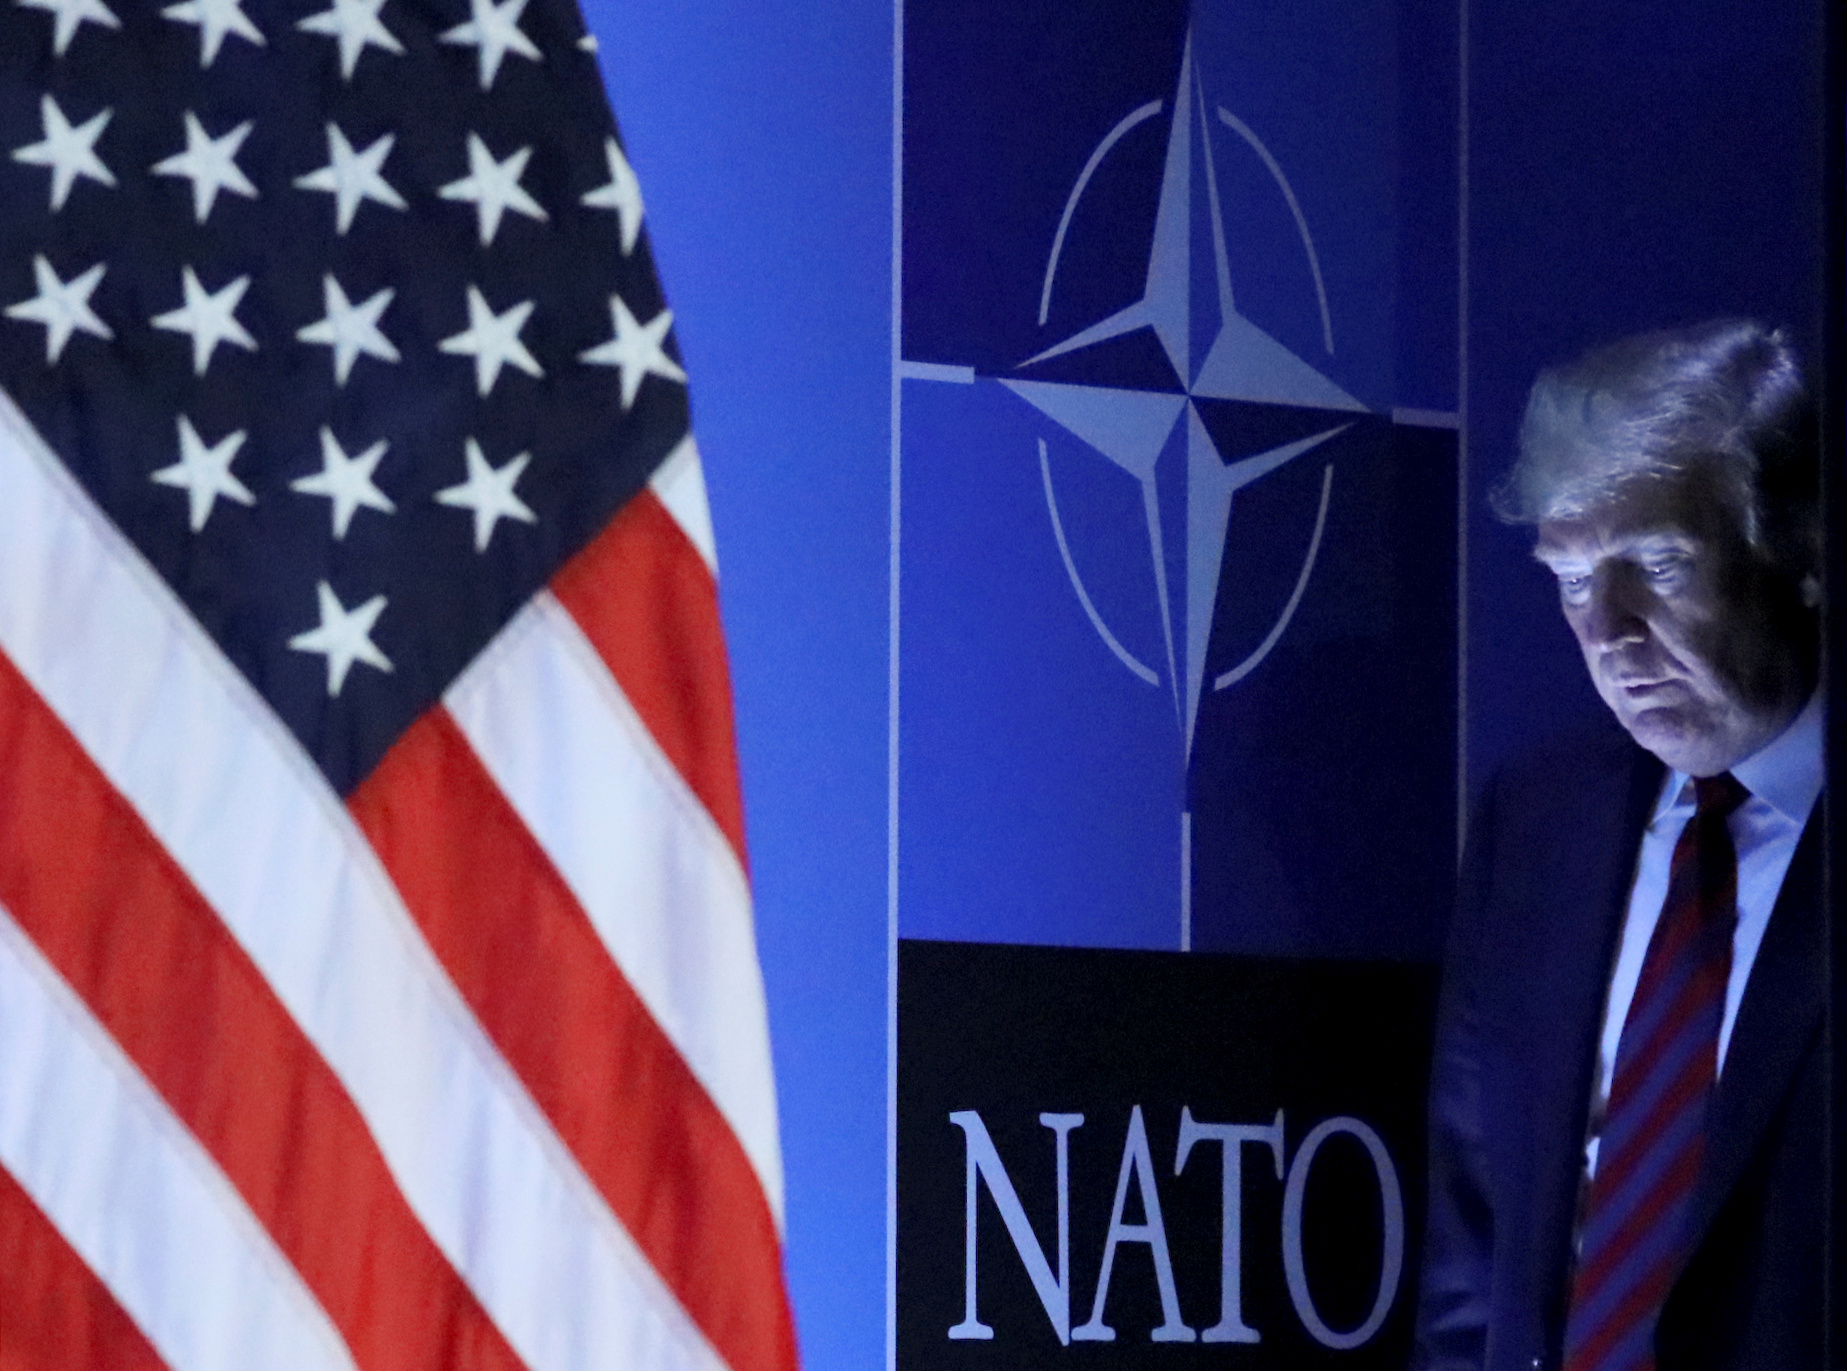 Trump Should Have Already Left NATO